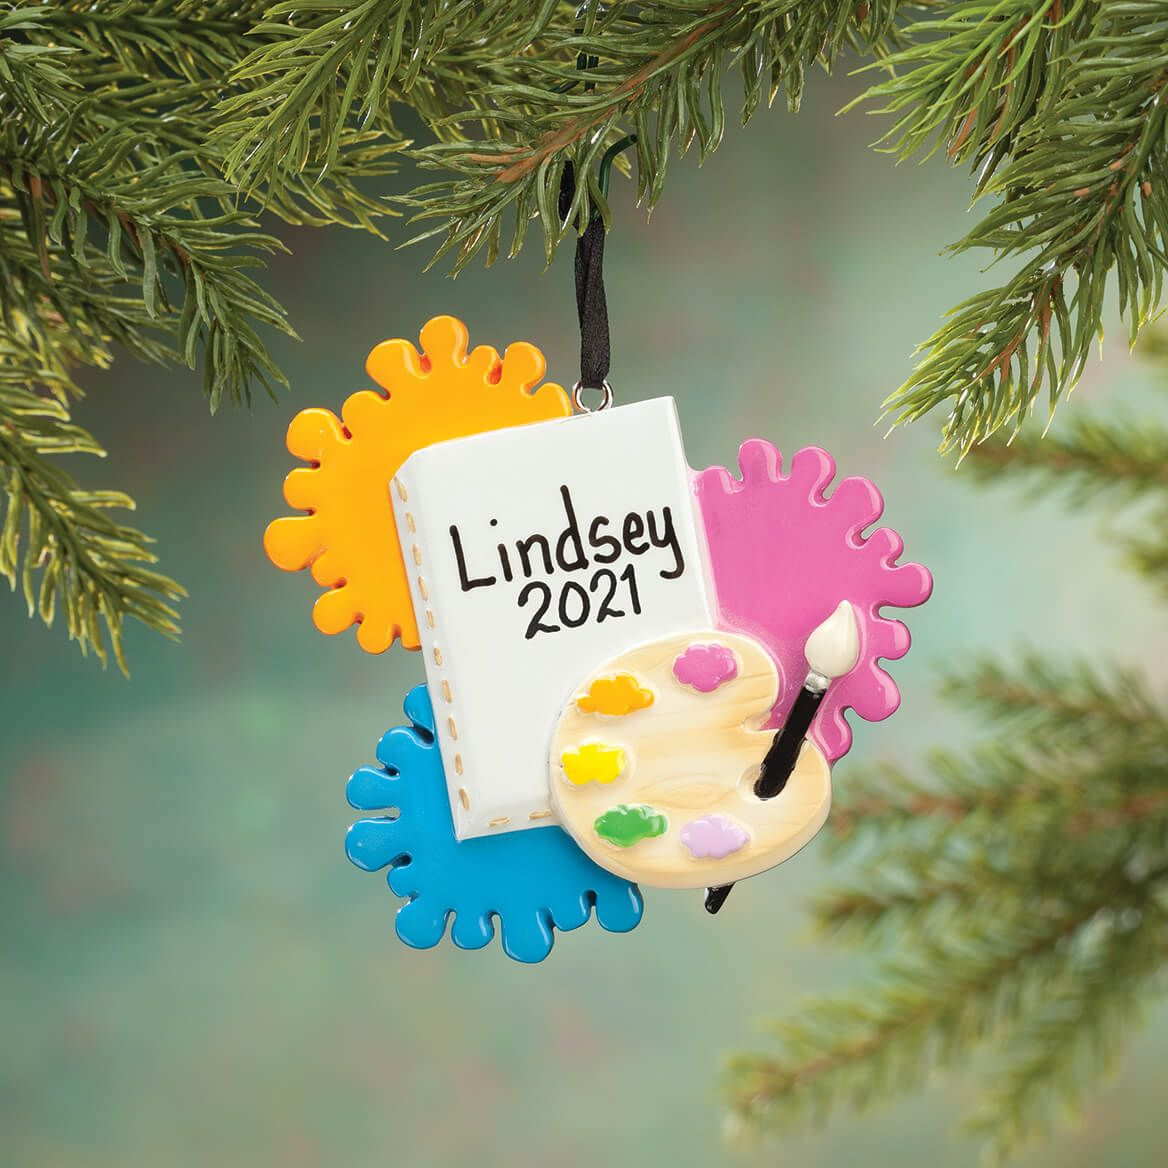 Personalized Artist Ornament-355956